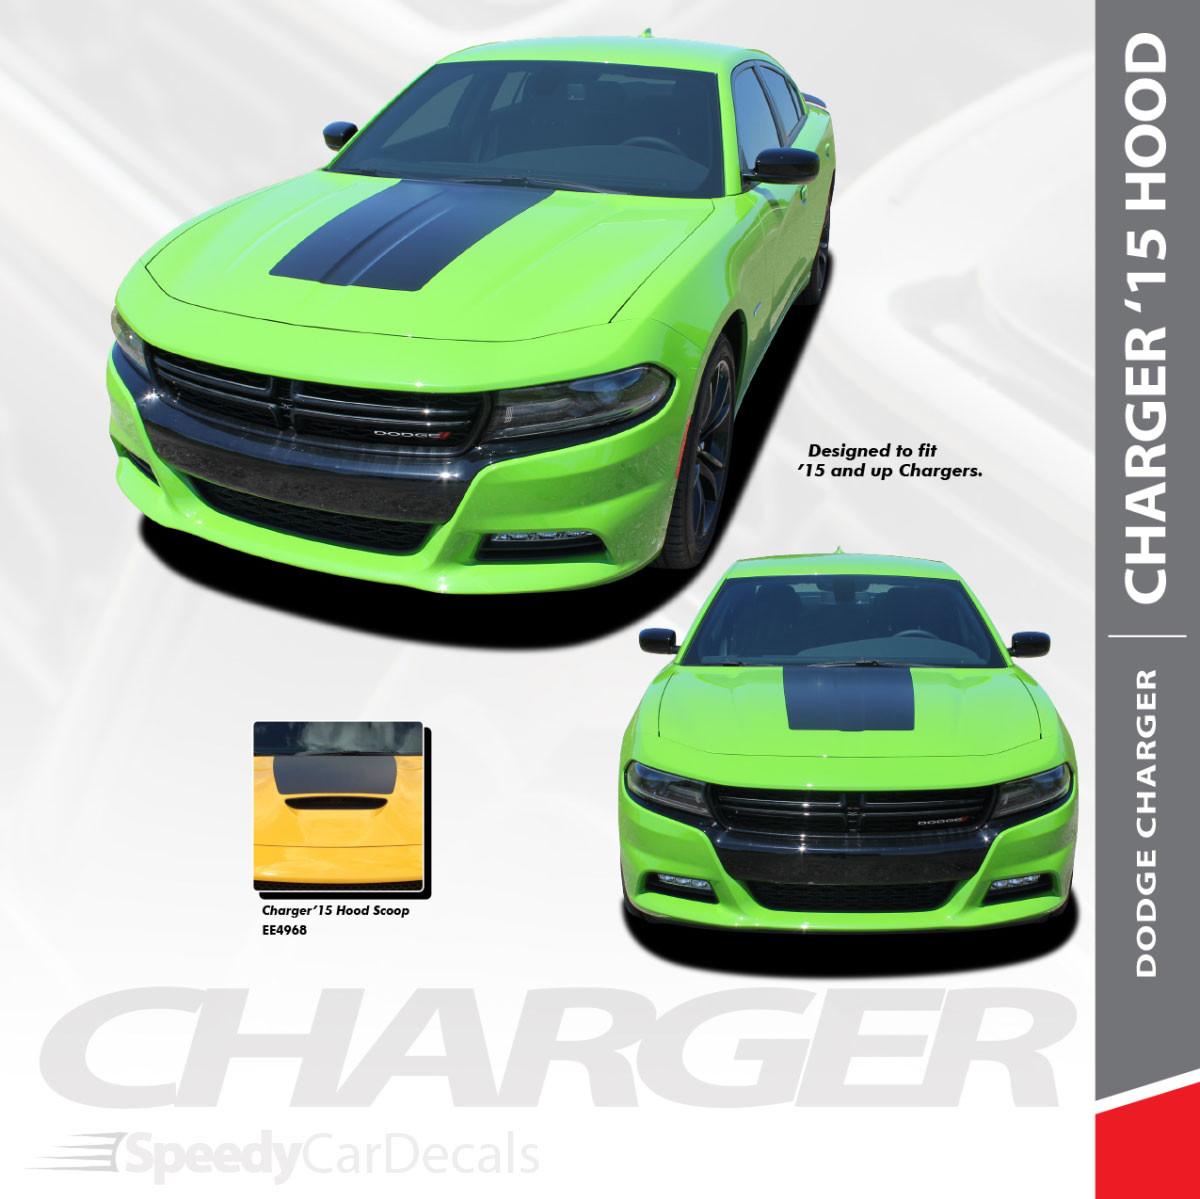 15 CHARGER HOOD | Dodge Charger Hood Decal Daytona Hemi SRT 392 Center Hood Stripe Vinyl Graphics 2015-2020